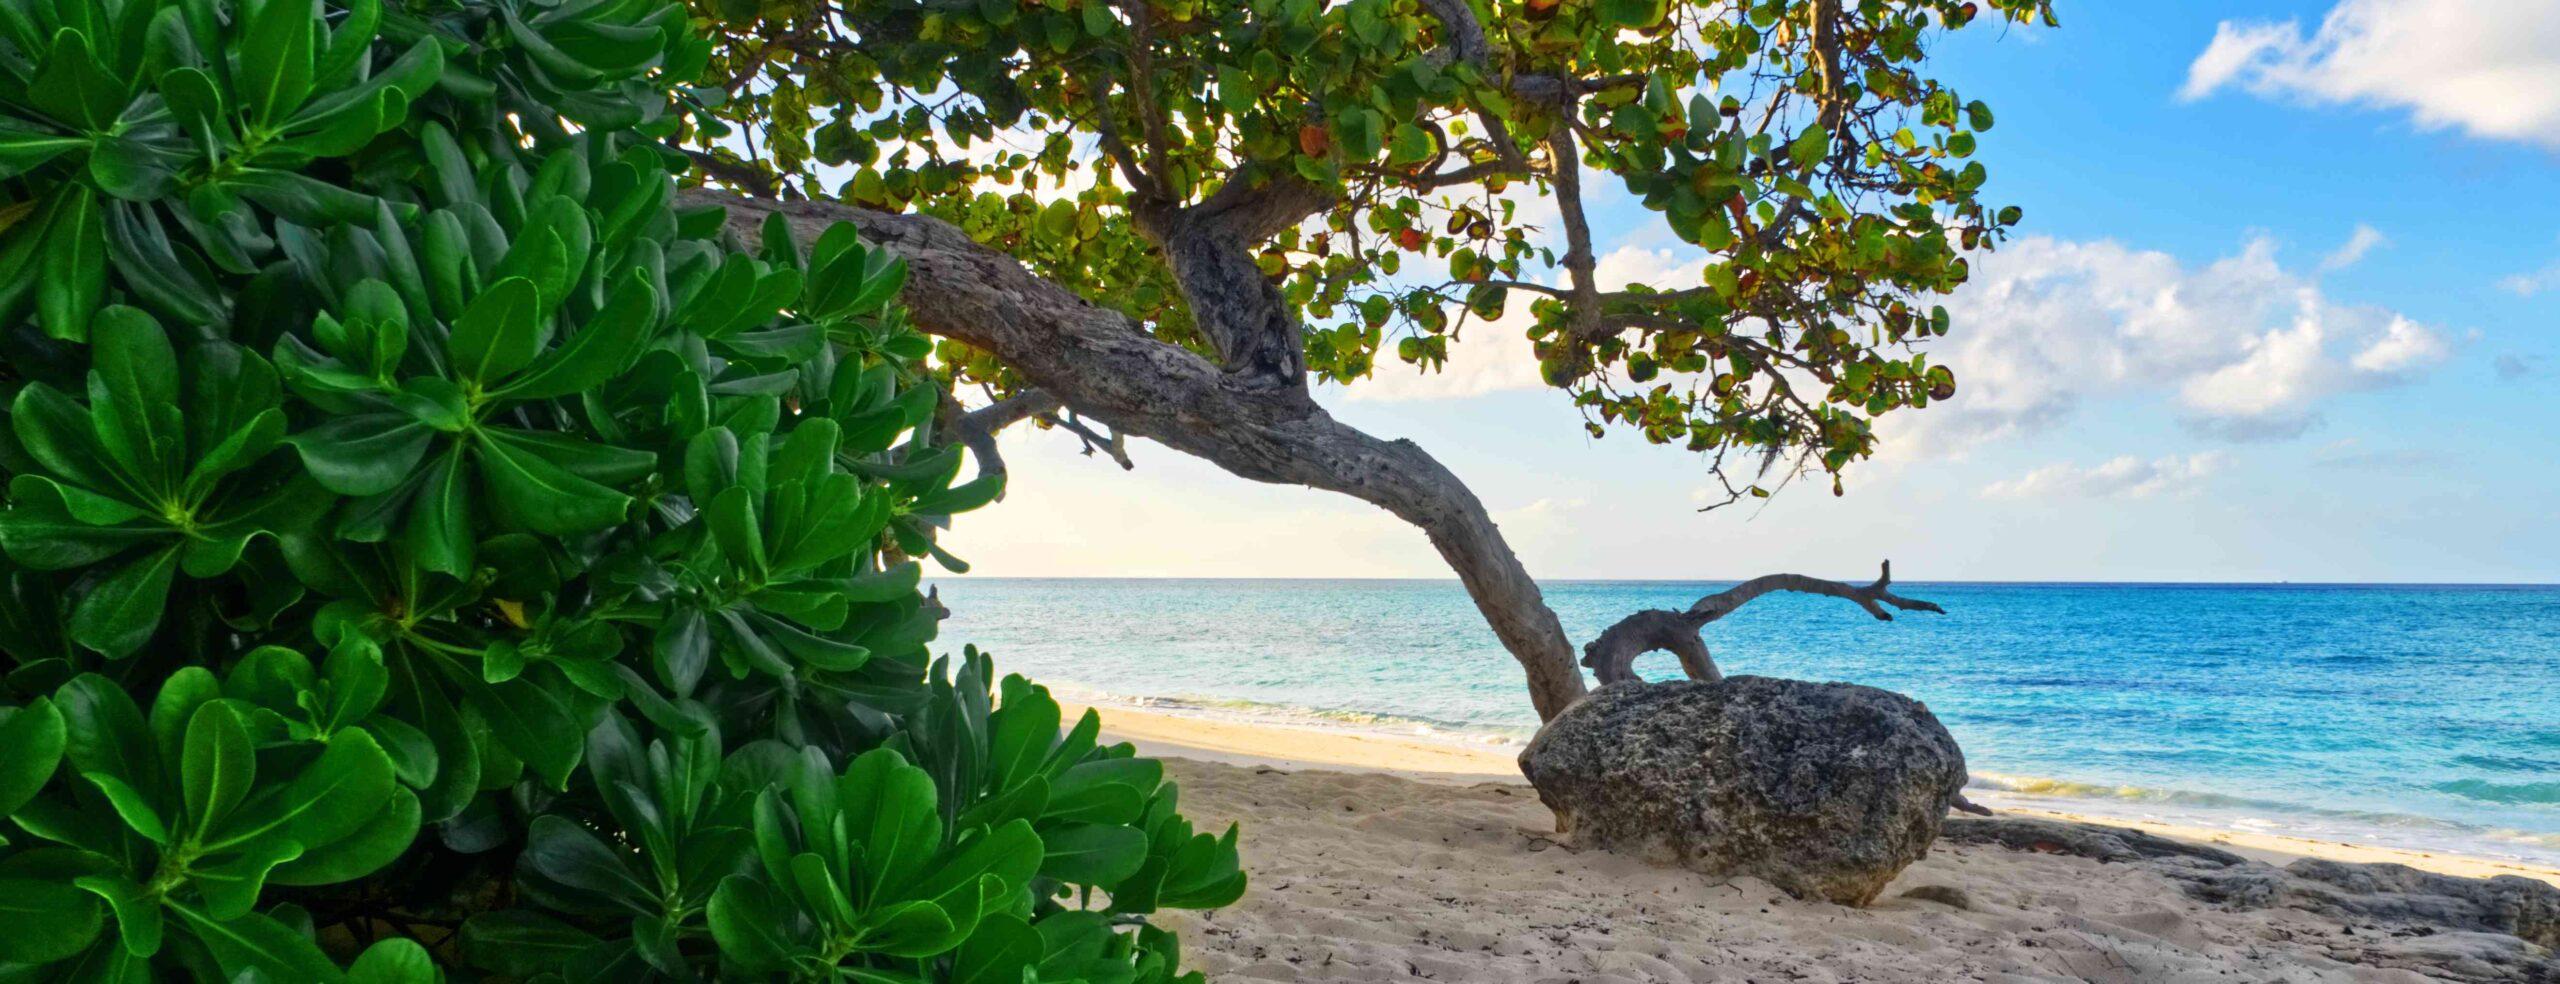 Beach, rock and foliage